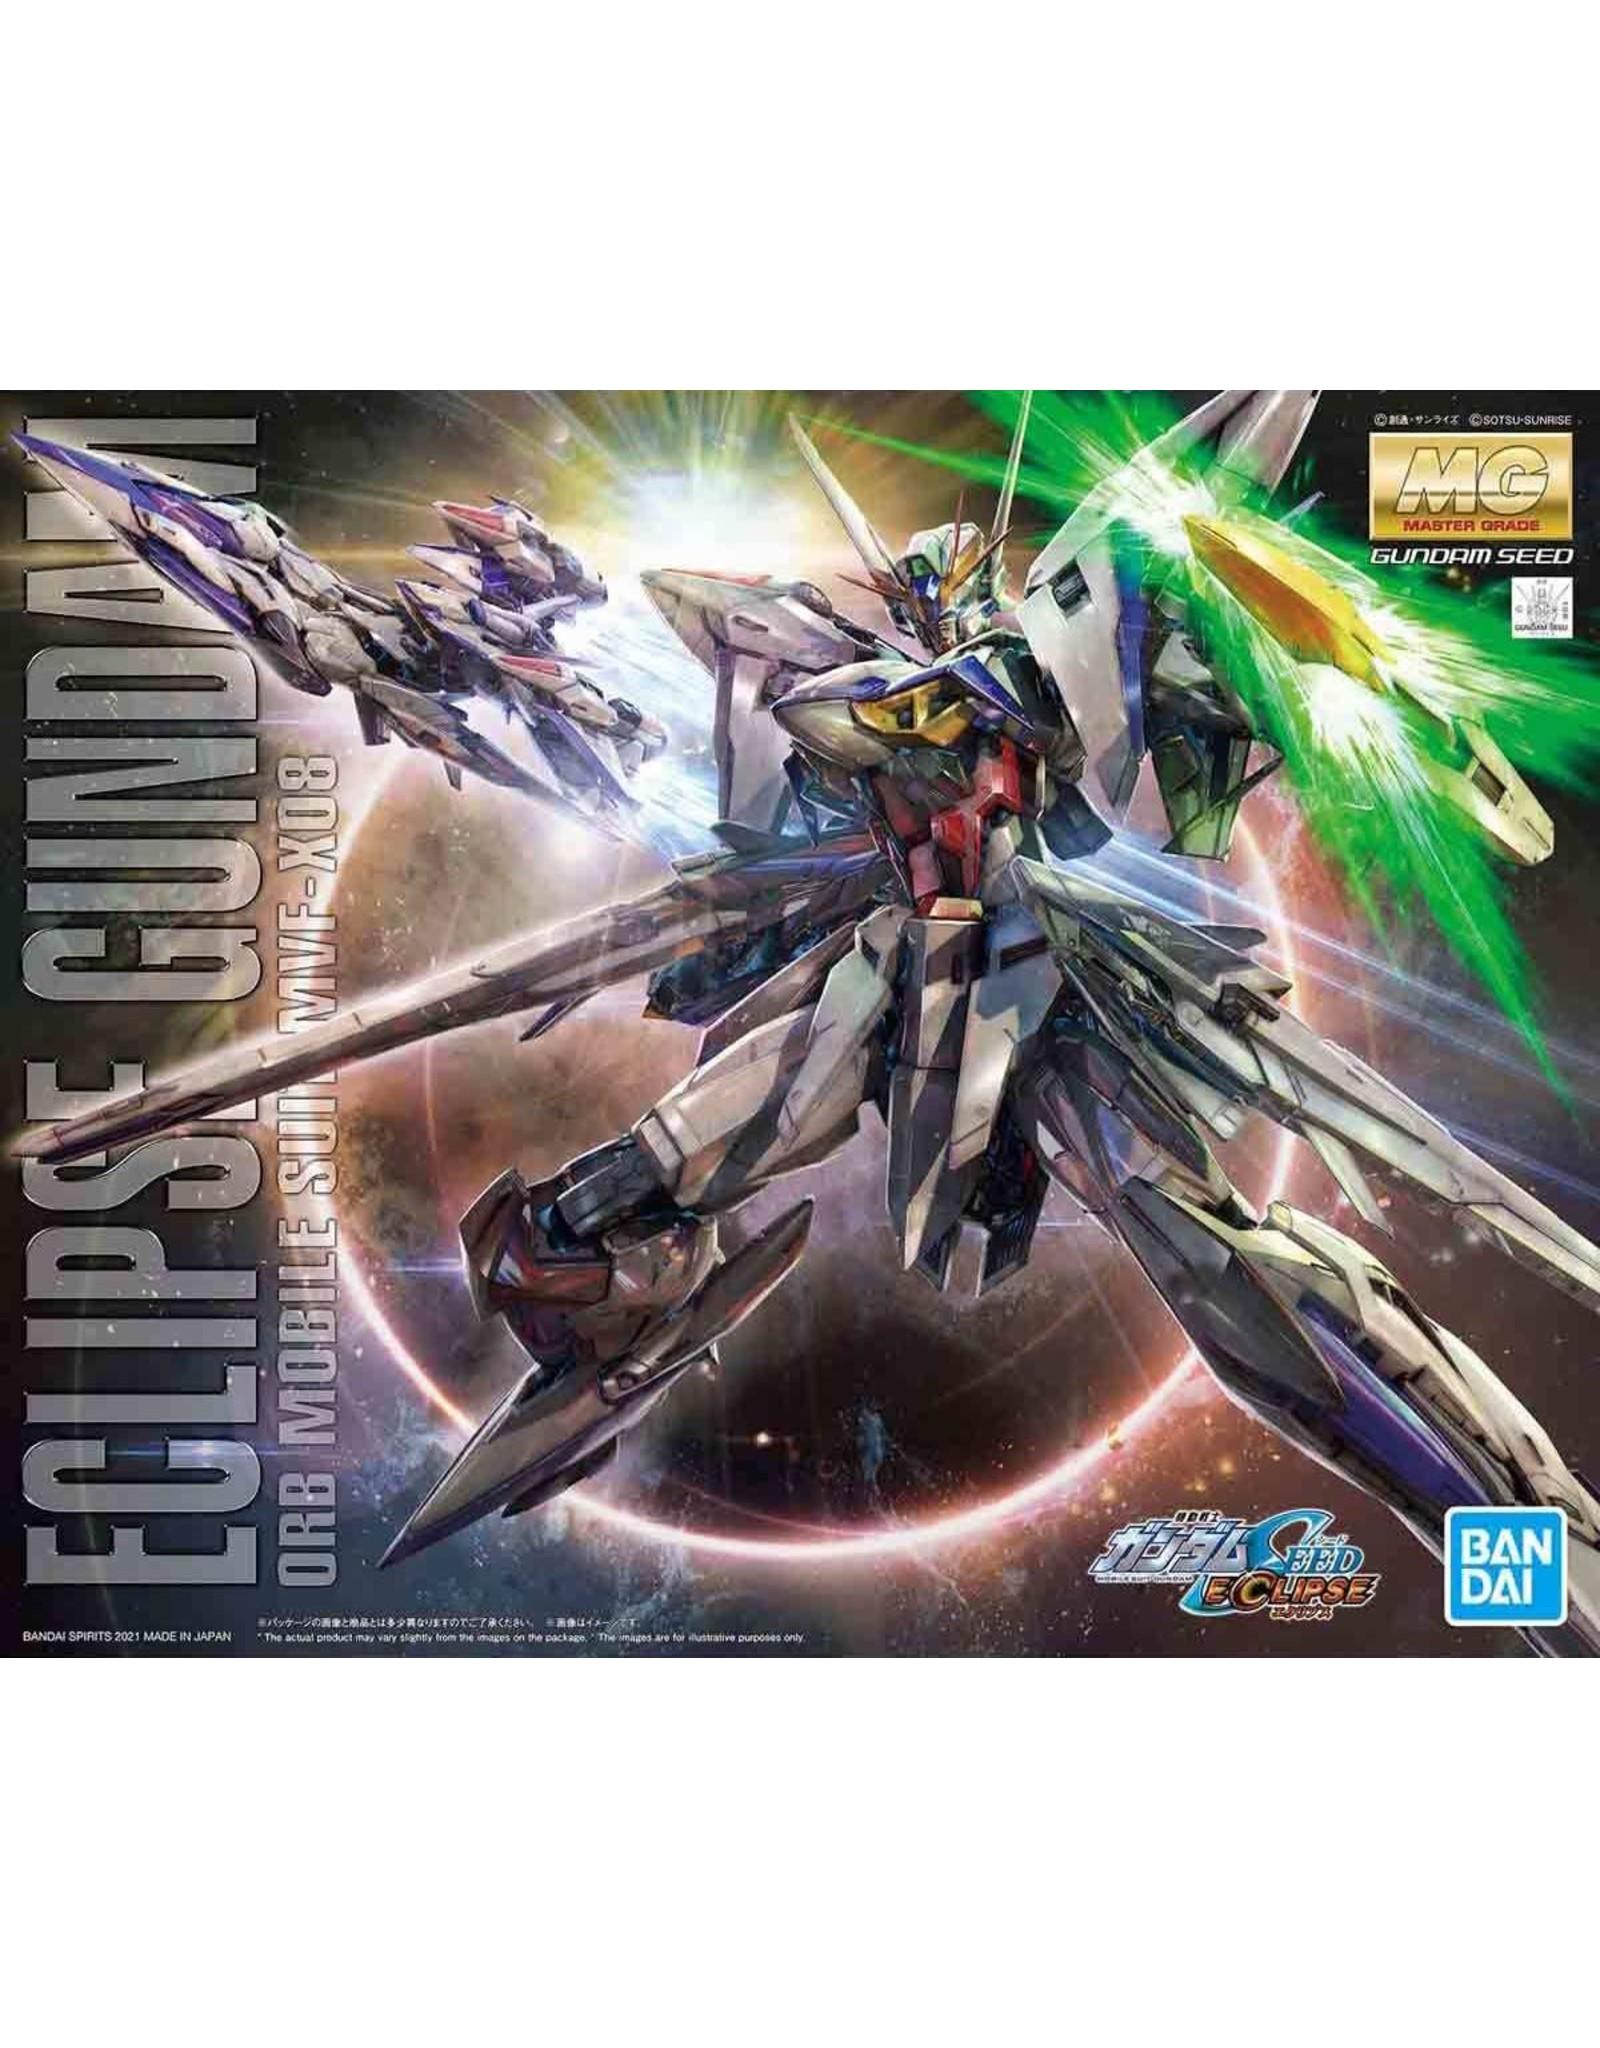 Bandai GUNDAM Model Kit MG - Eclipse Gundam